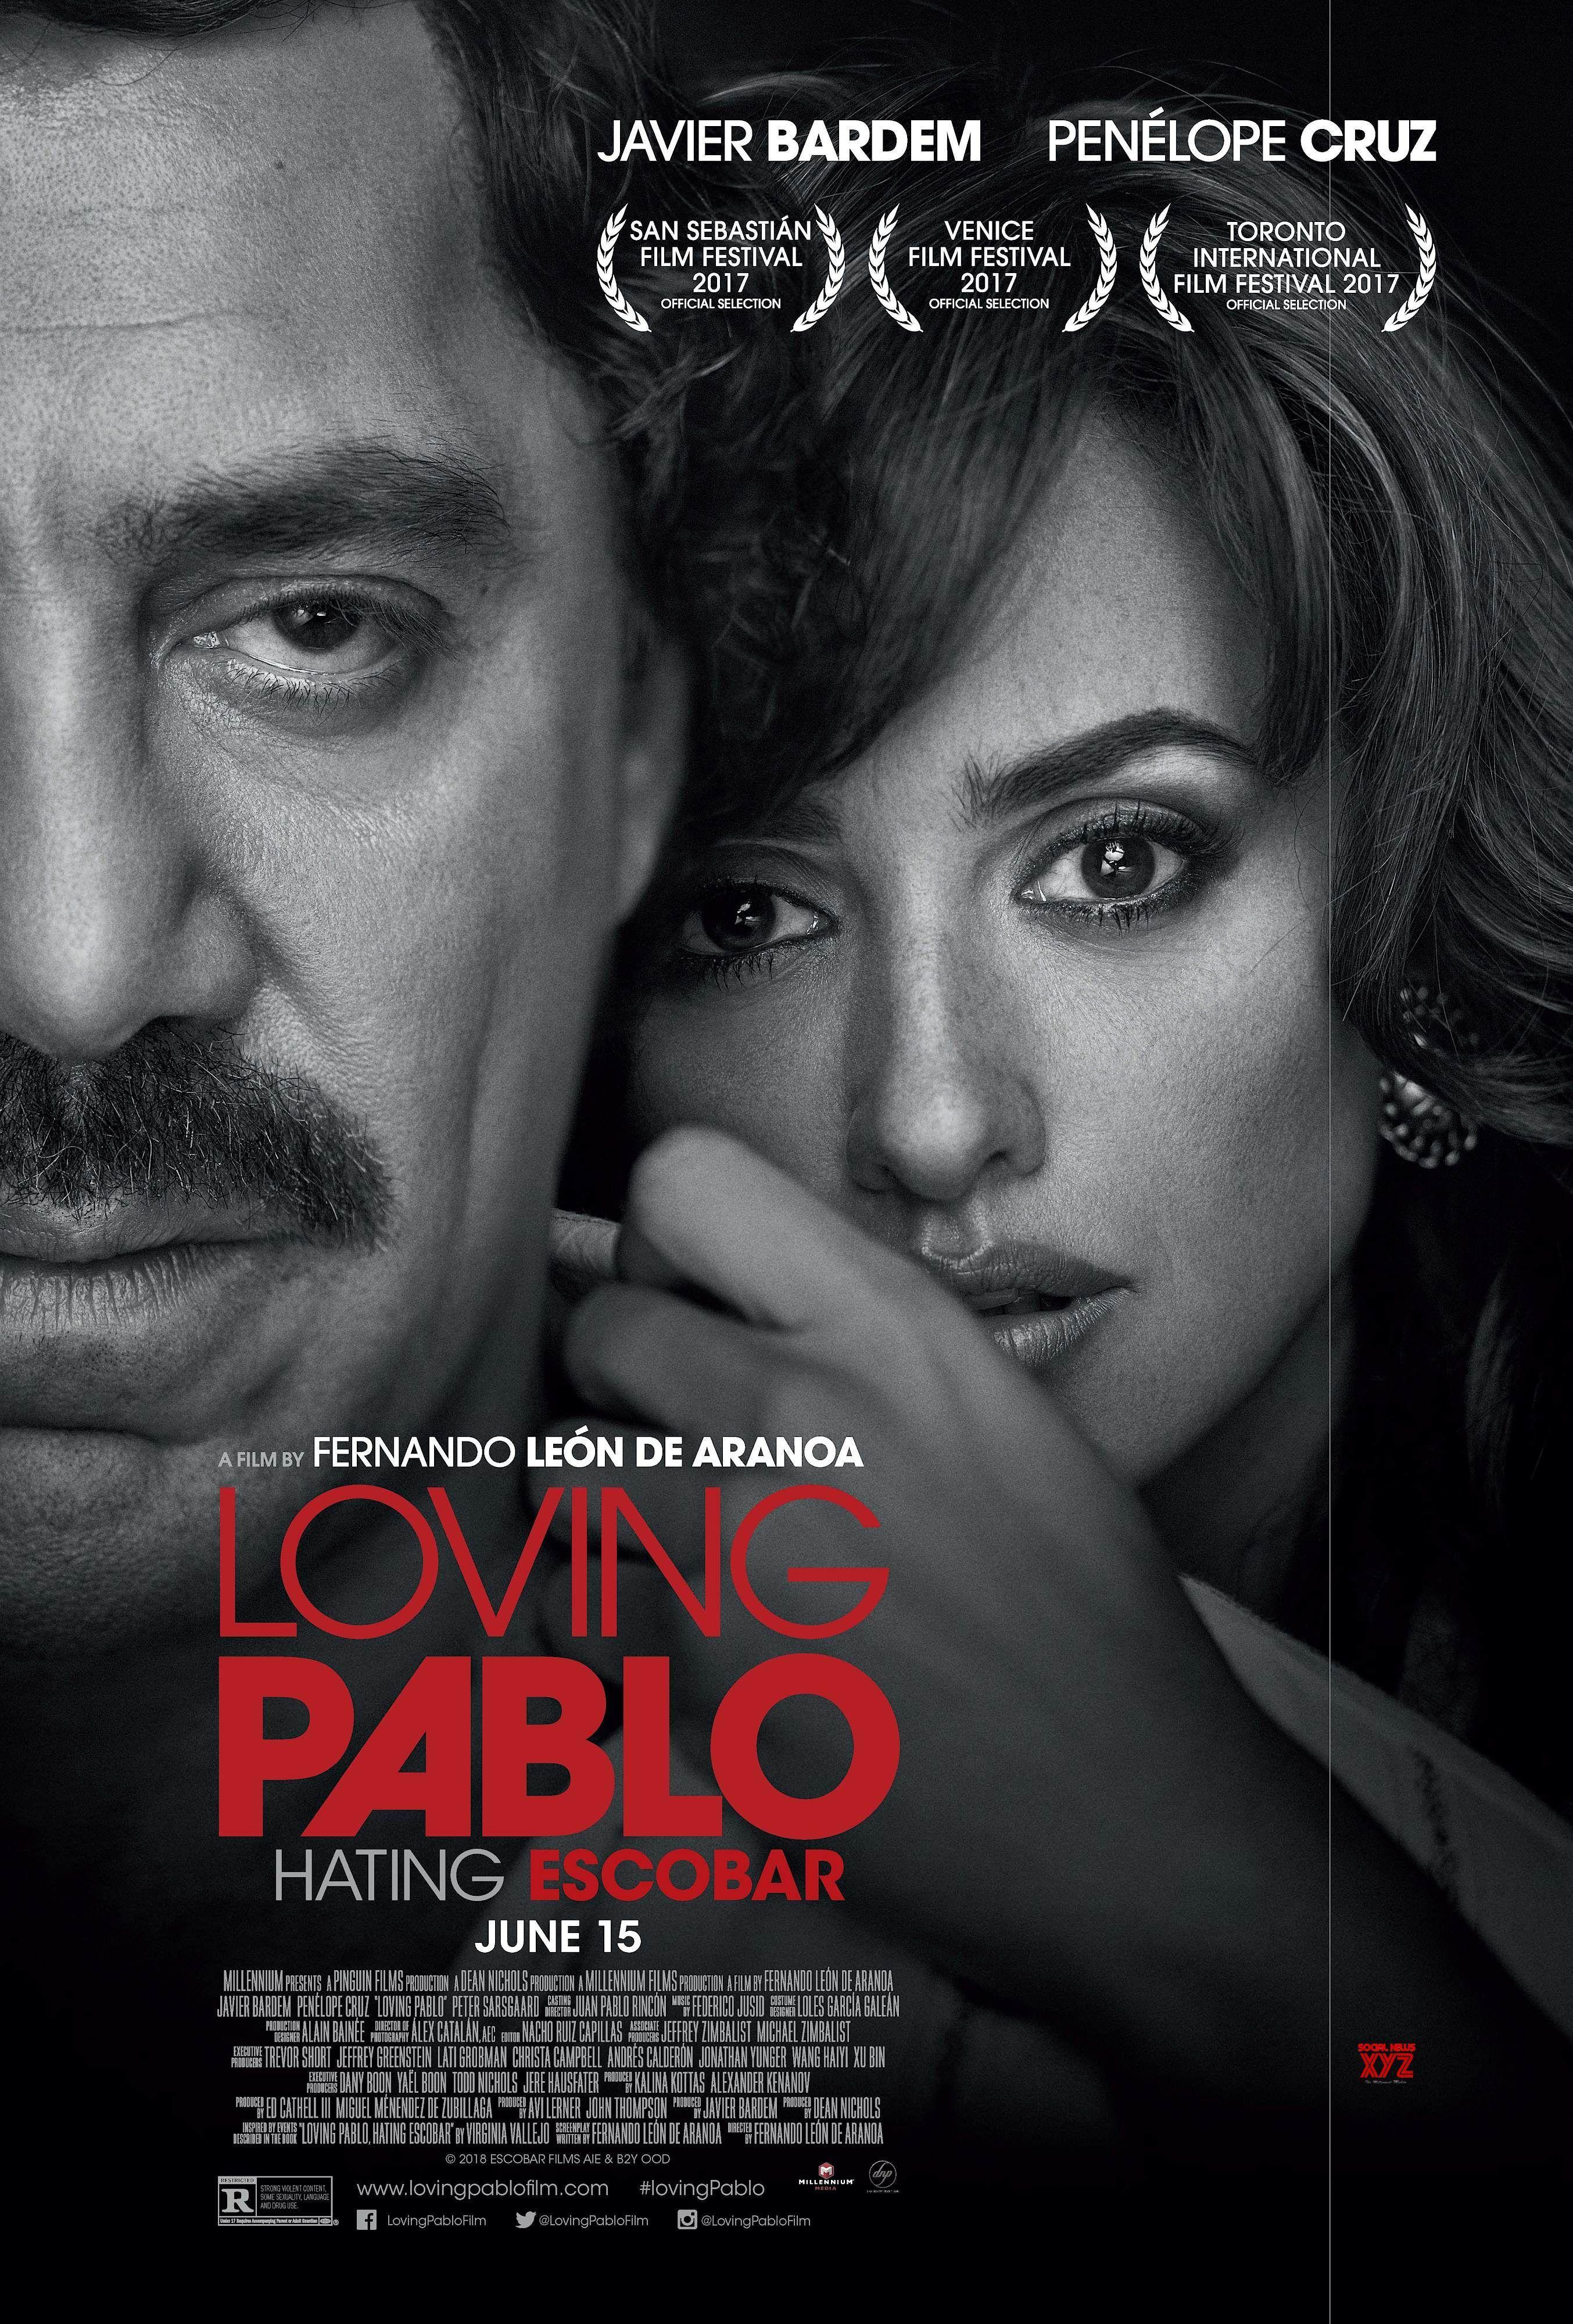 Loving Pablo Movie Stills And Poster Social News Xyz Escobar Film Escobar Movie Javier Bardem